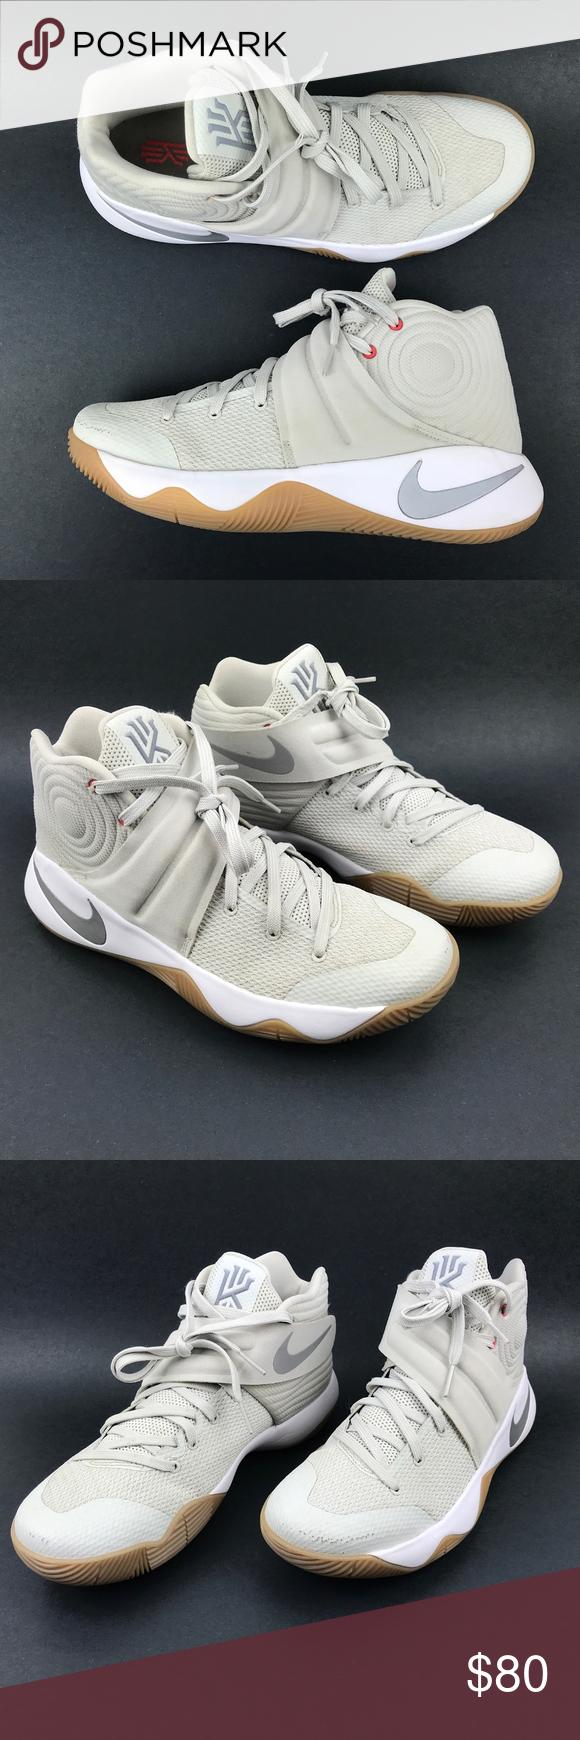 Nike Kyrie 2 Tan Basketball Shoes Mens